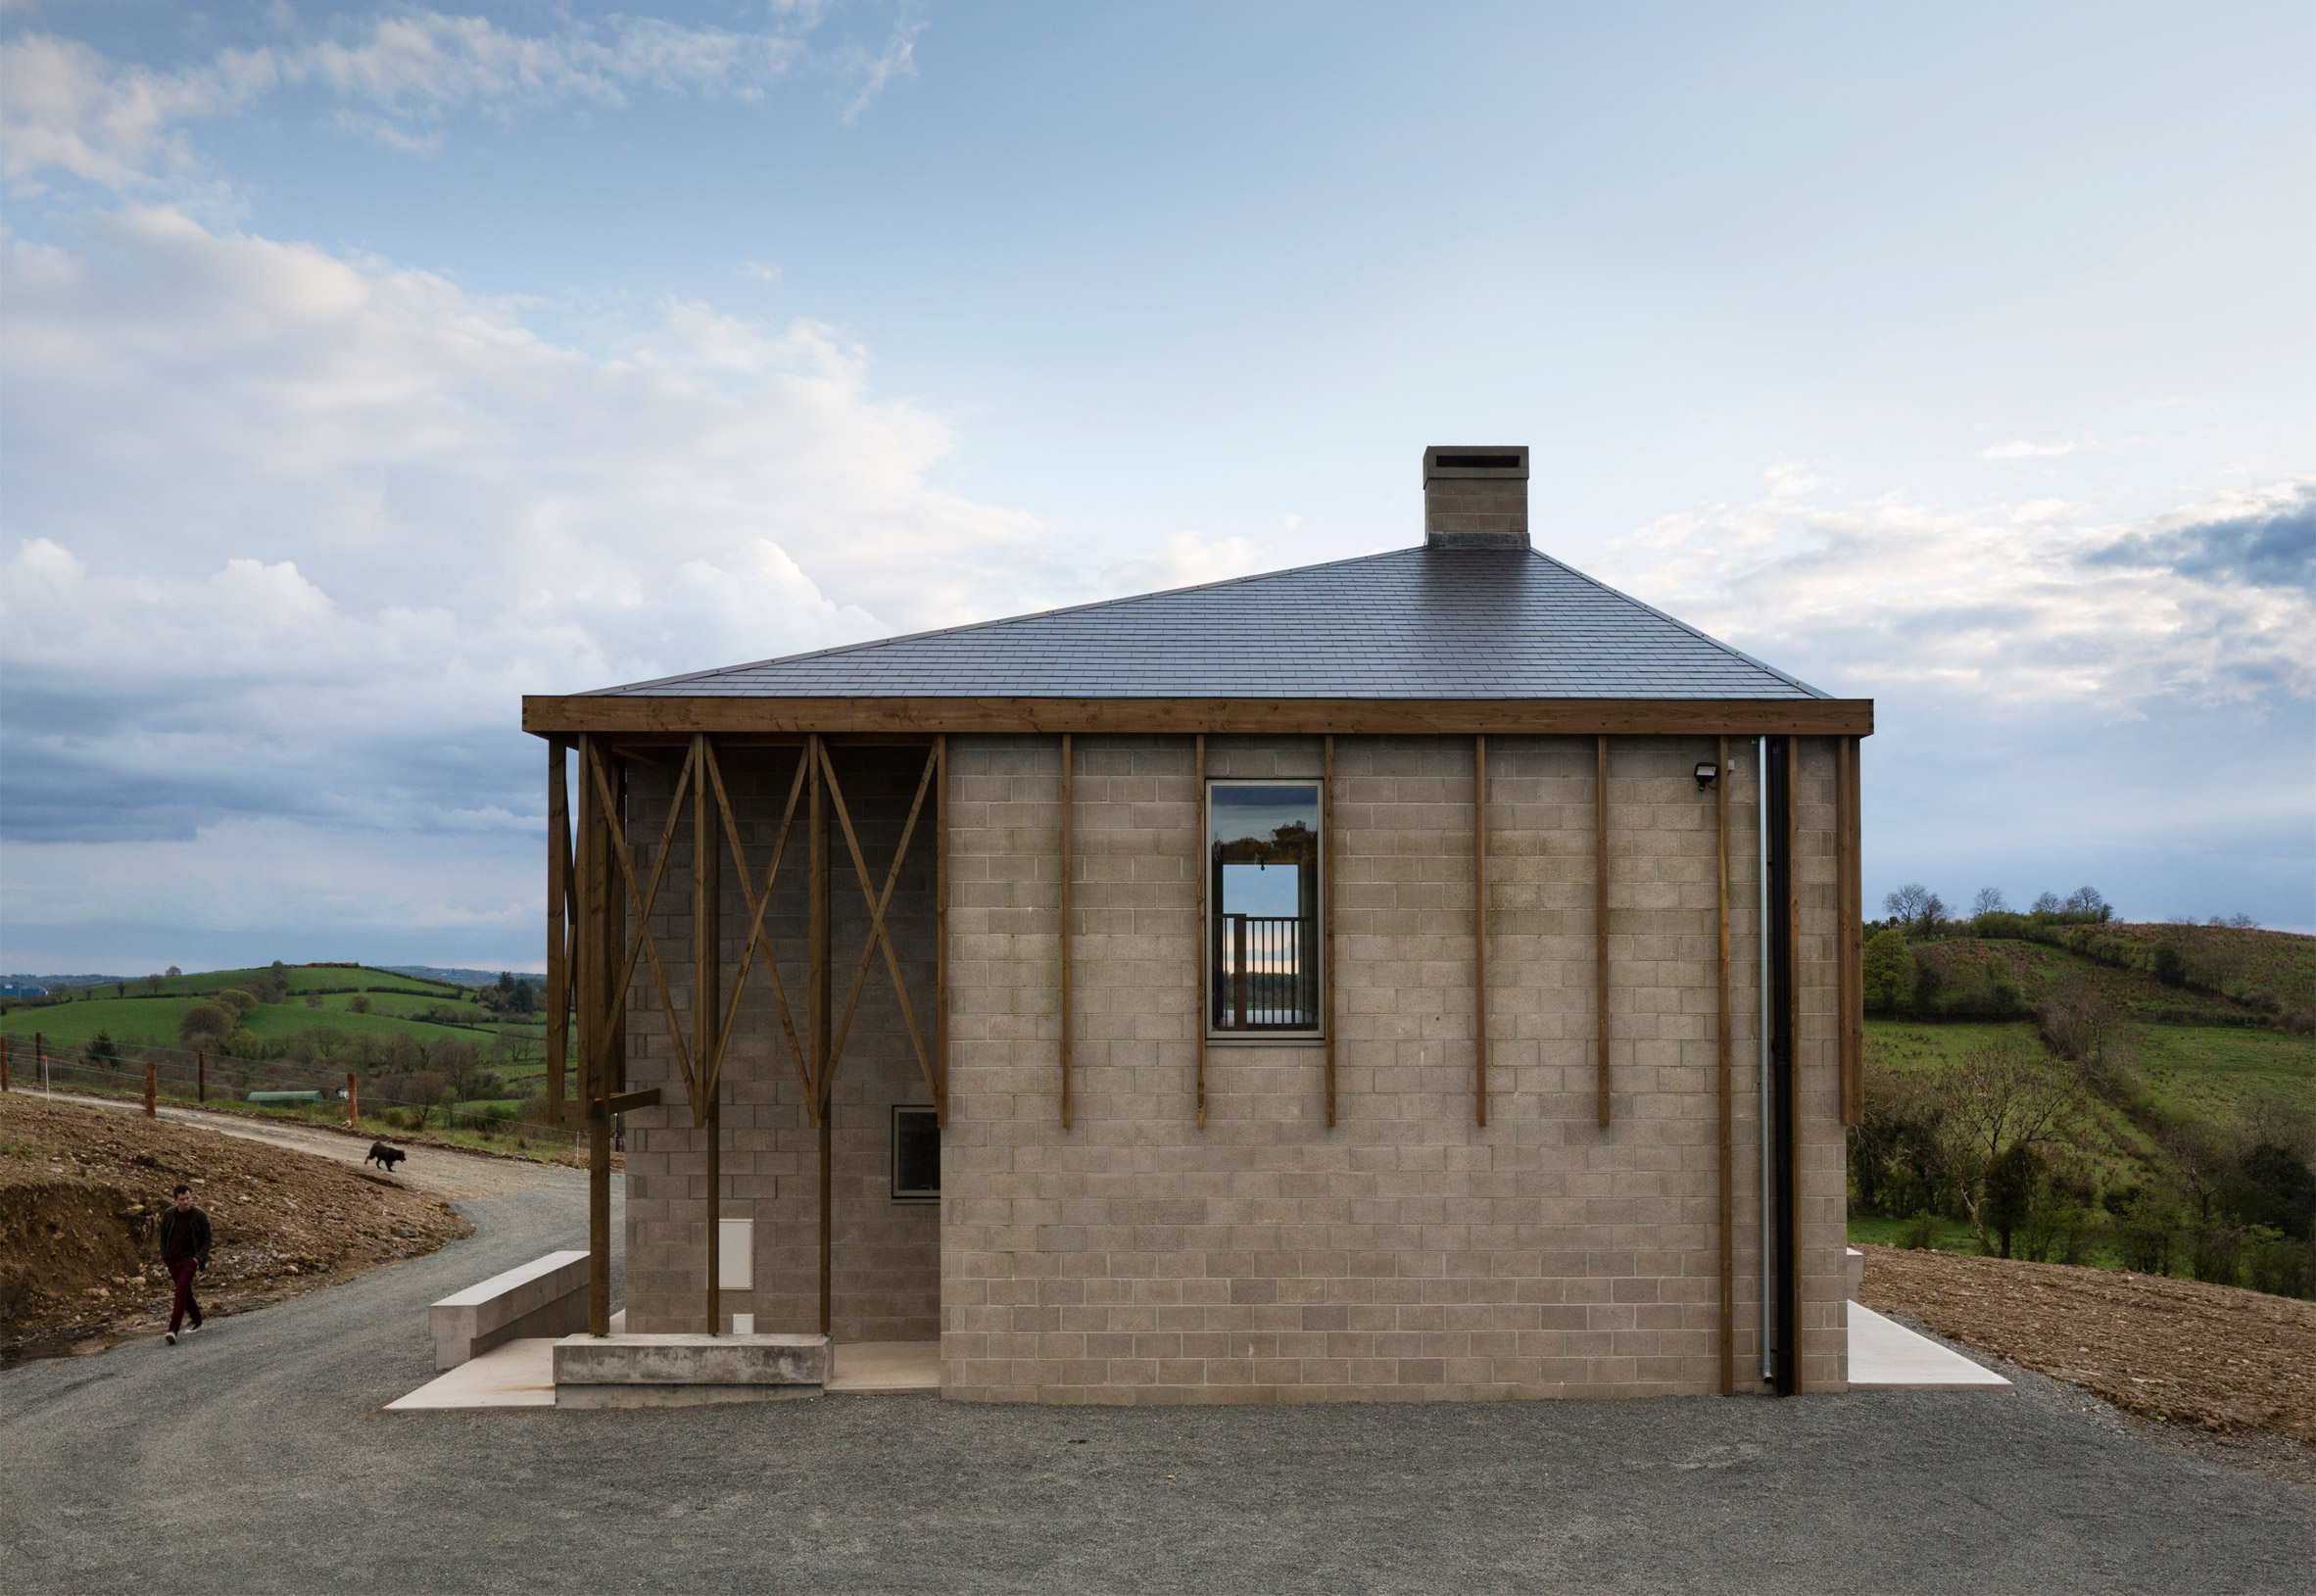 Killan Farmhouse by Thomas O'Brien in Ireland